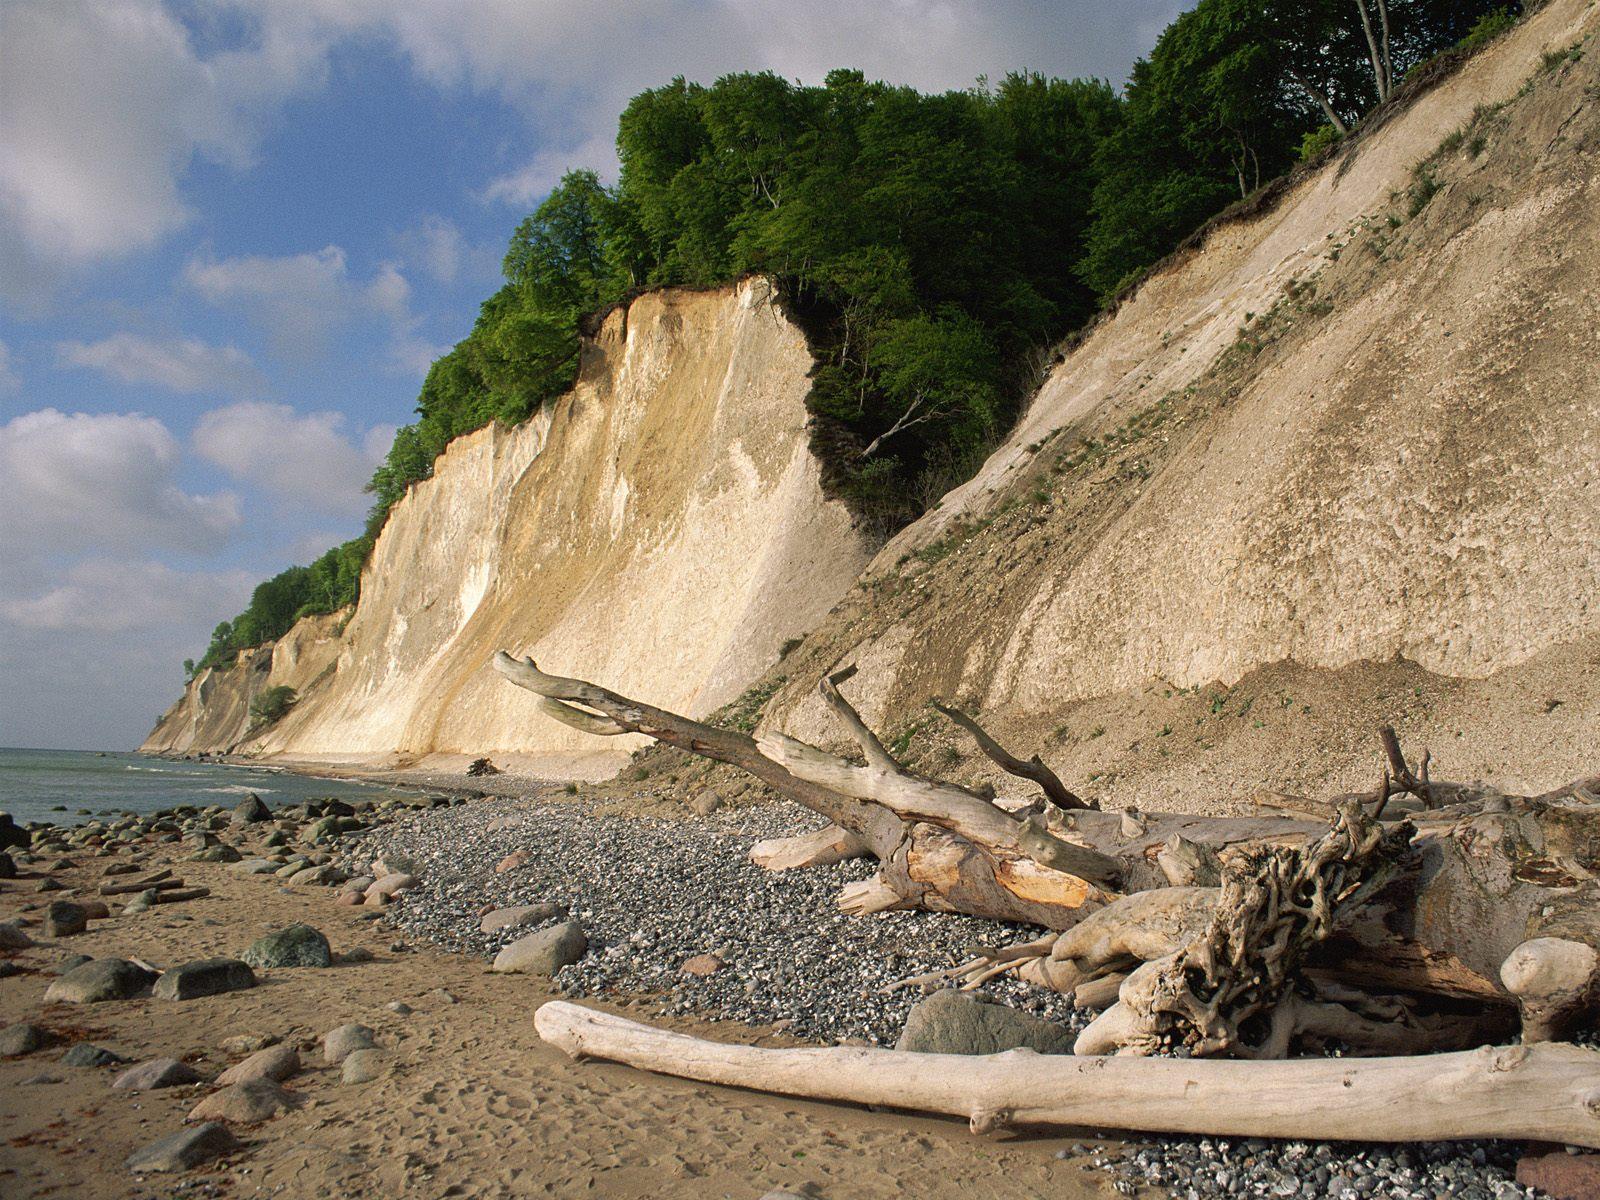 Tropical Island Beach Ambience Sound: على شاطئ بحر البلطيق